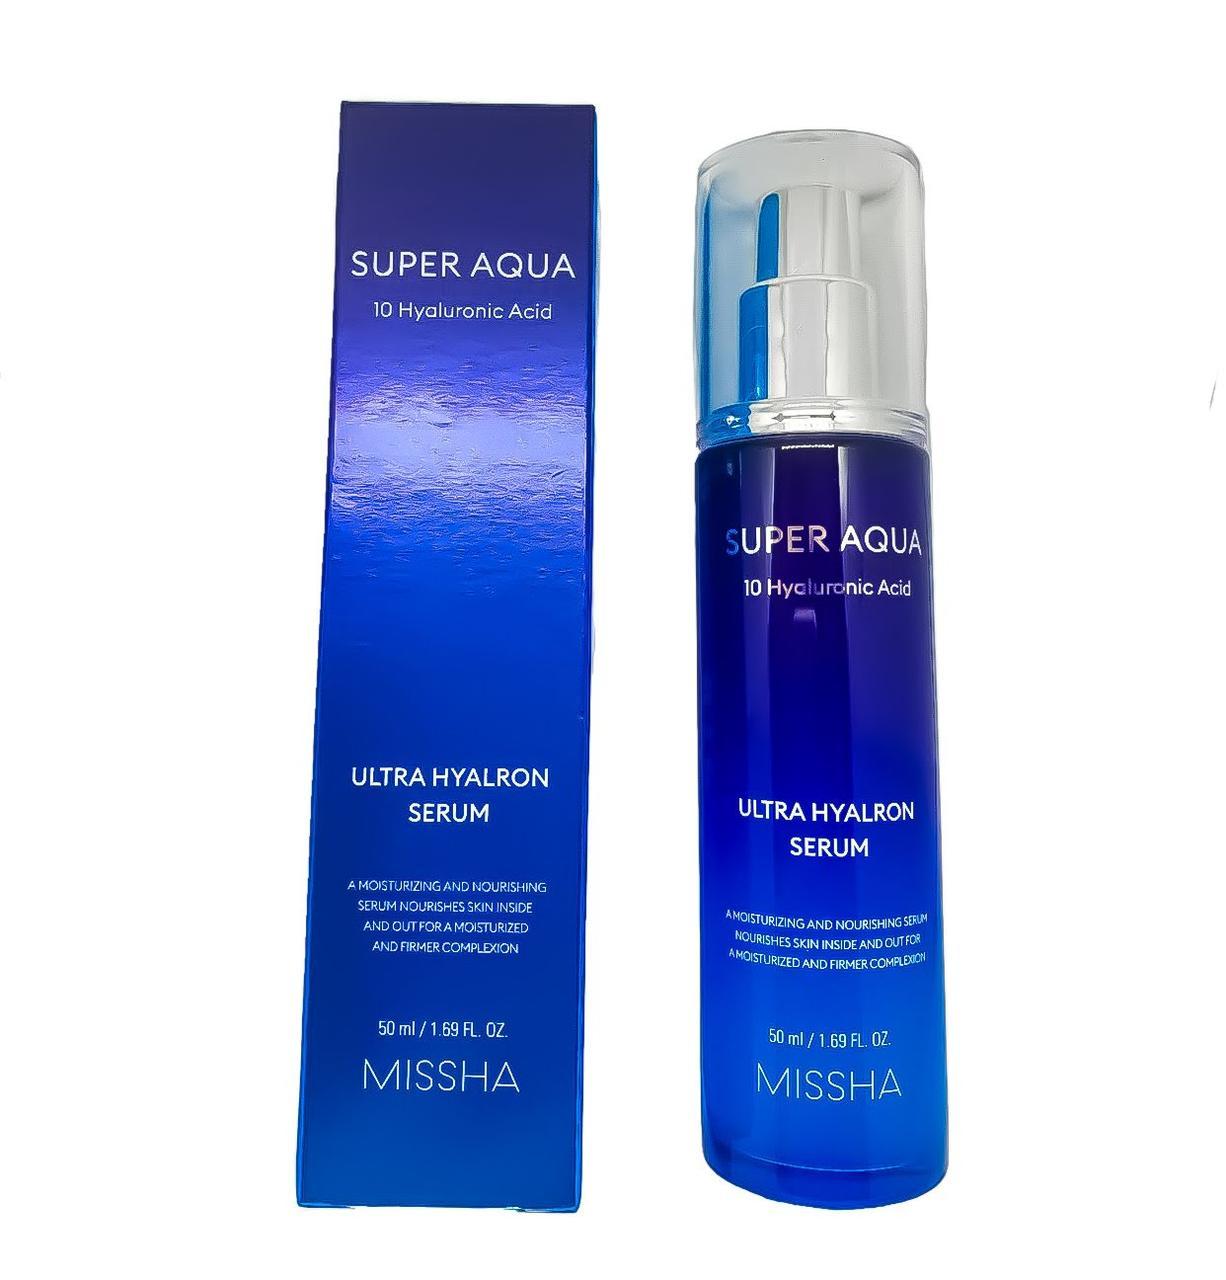 Сыворотка увлажняющая MISSHA Super Aqua Ultra Hyalron serum